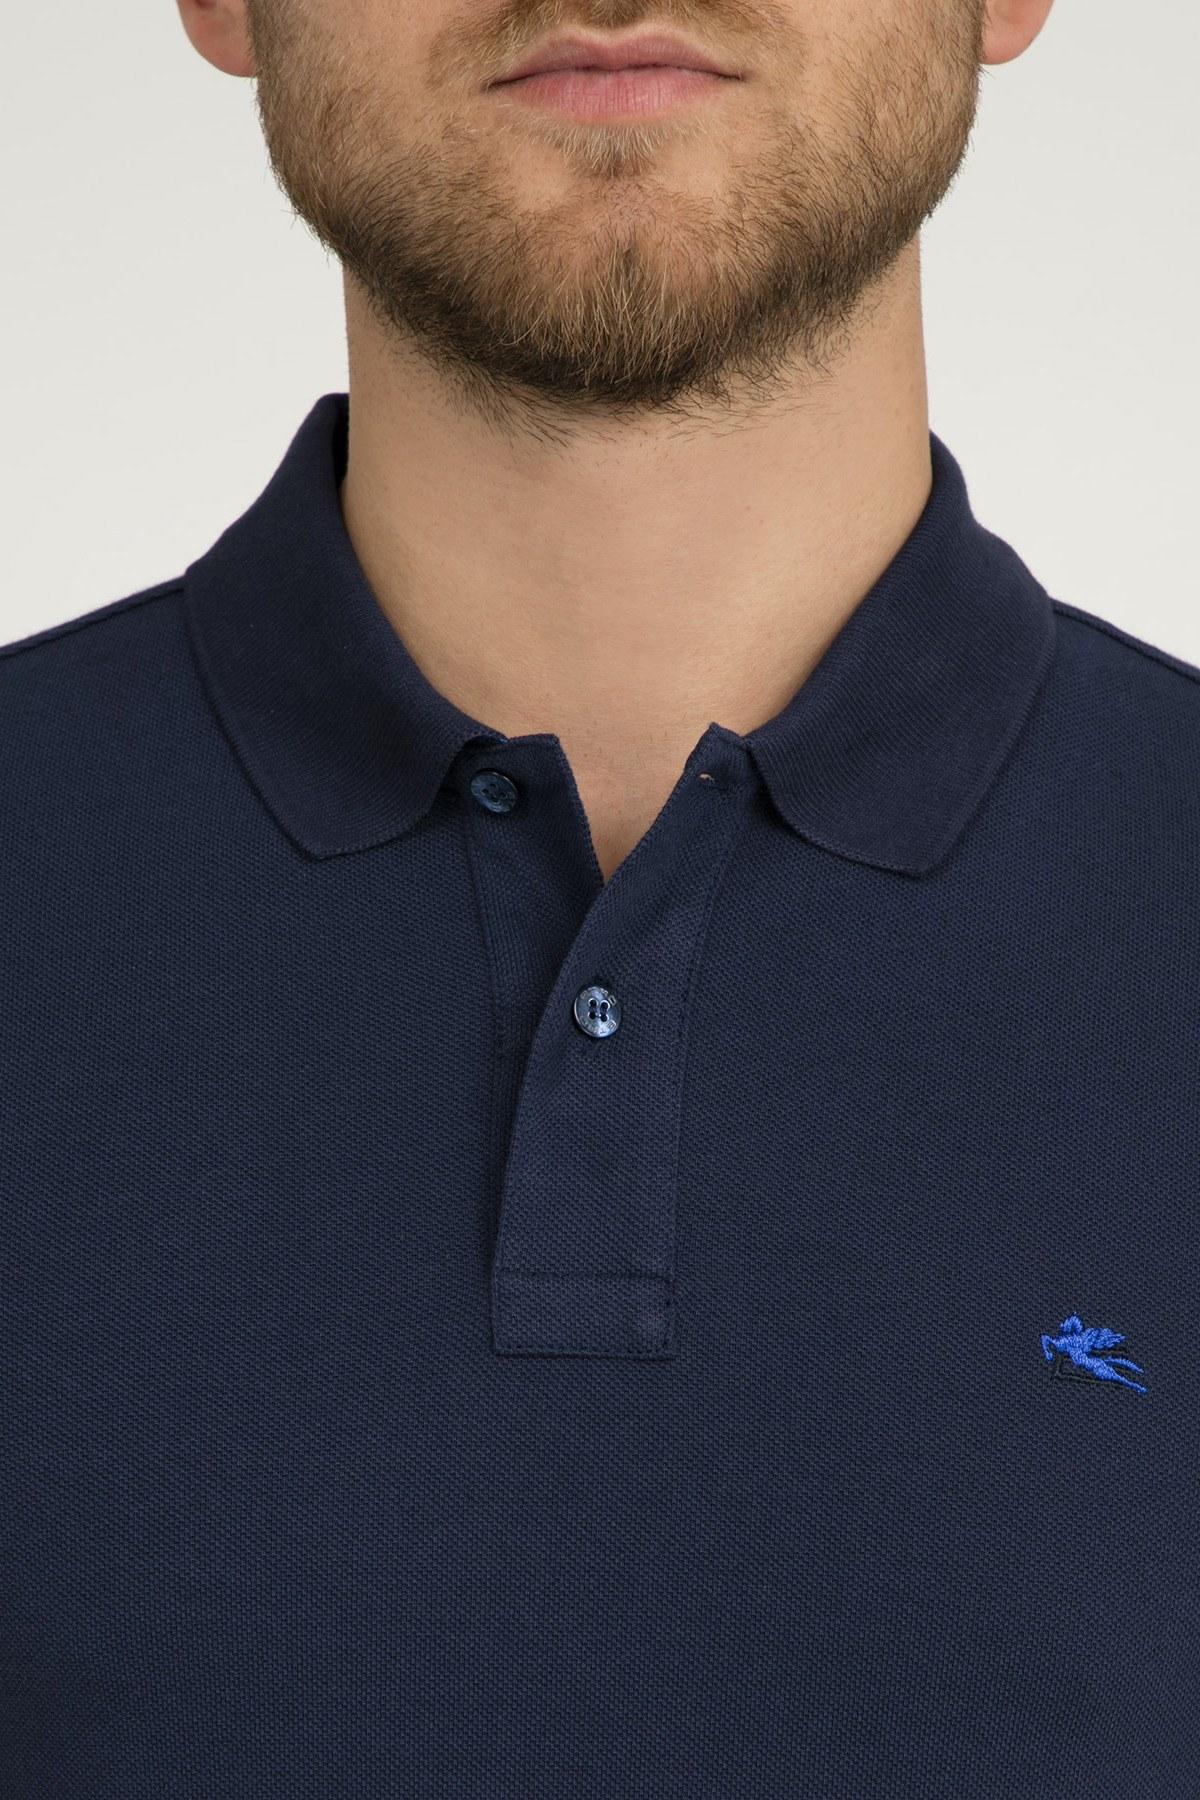 Etro Erkek T Shirt 1Y140 9480 200